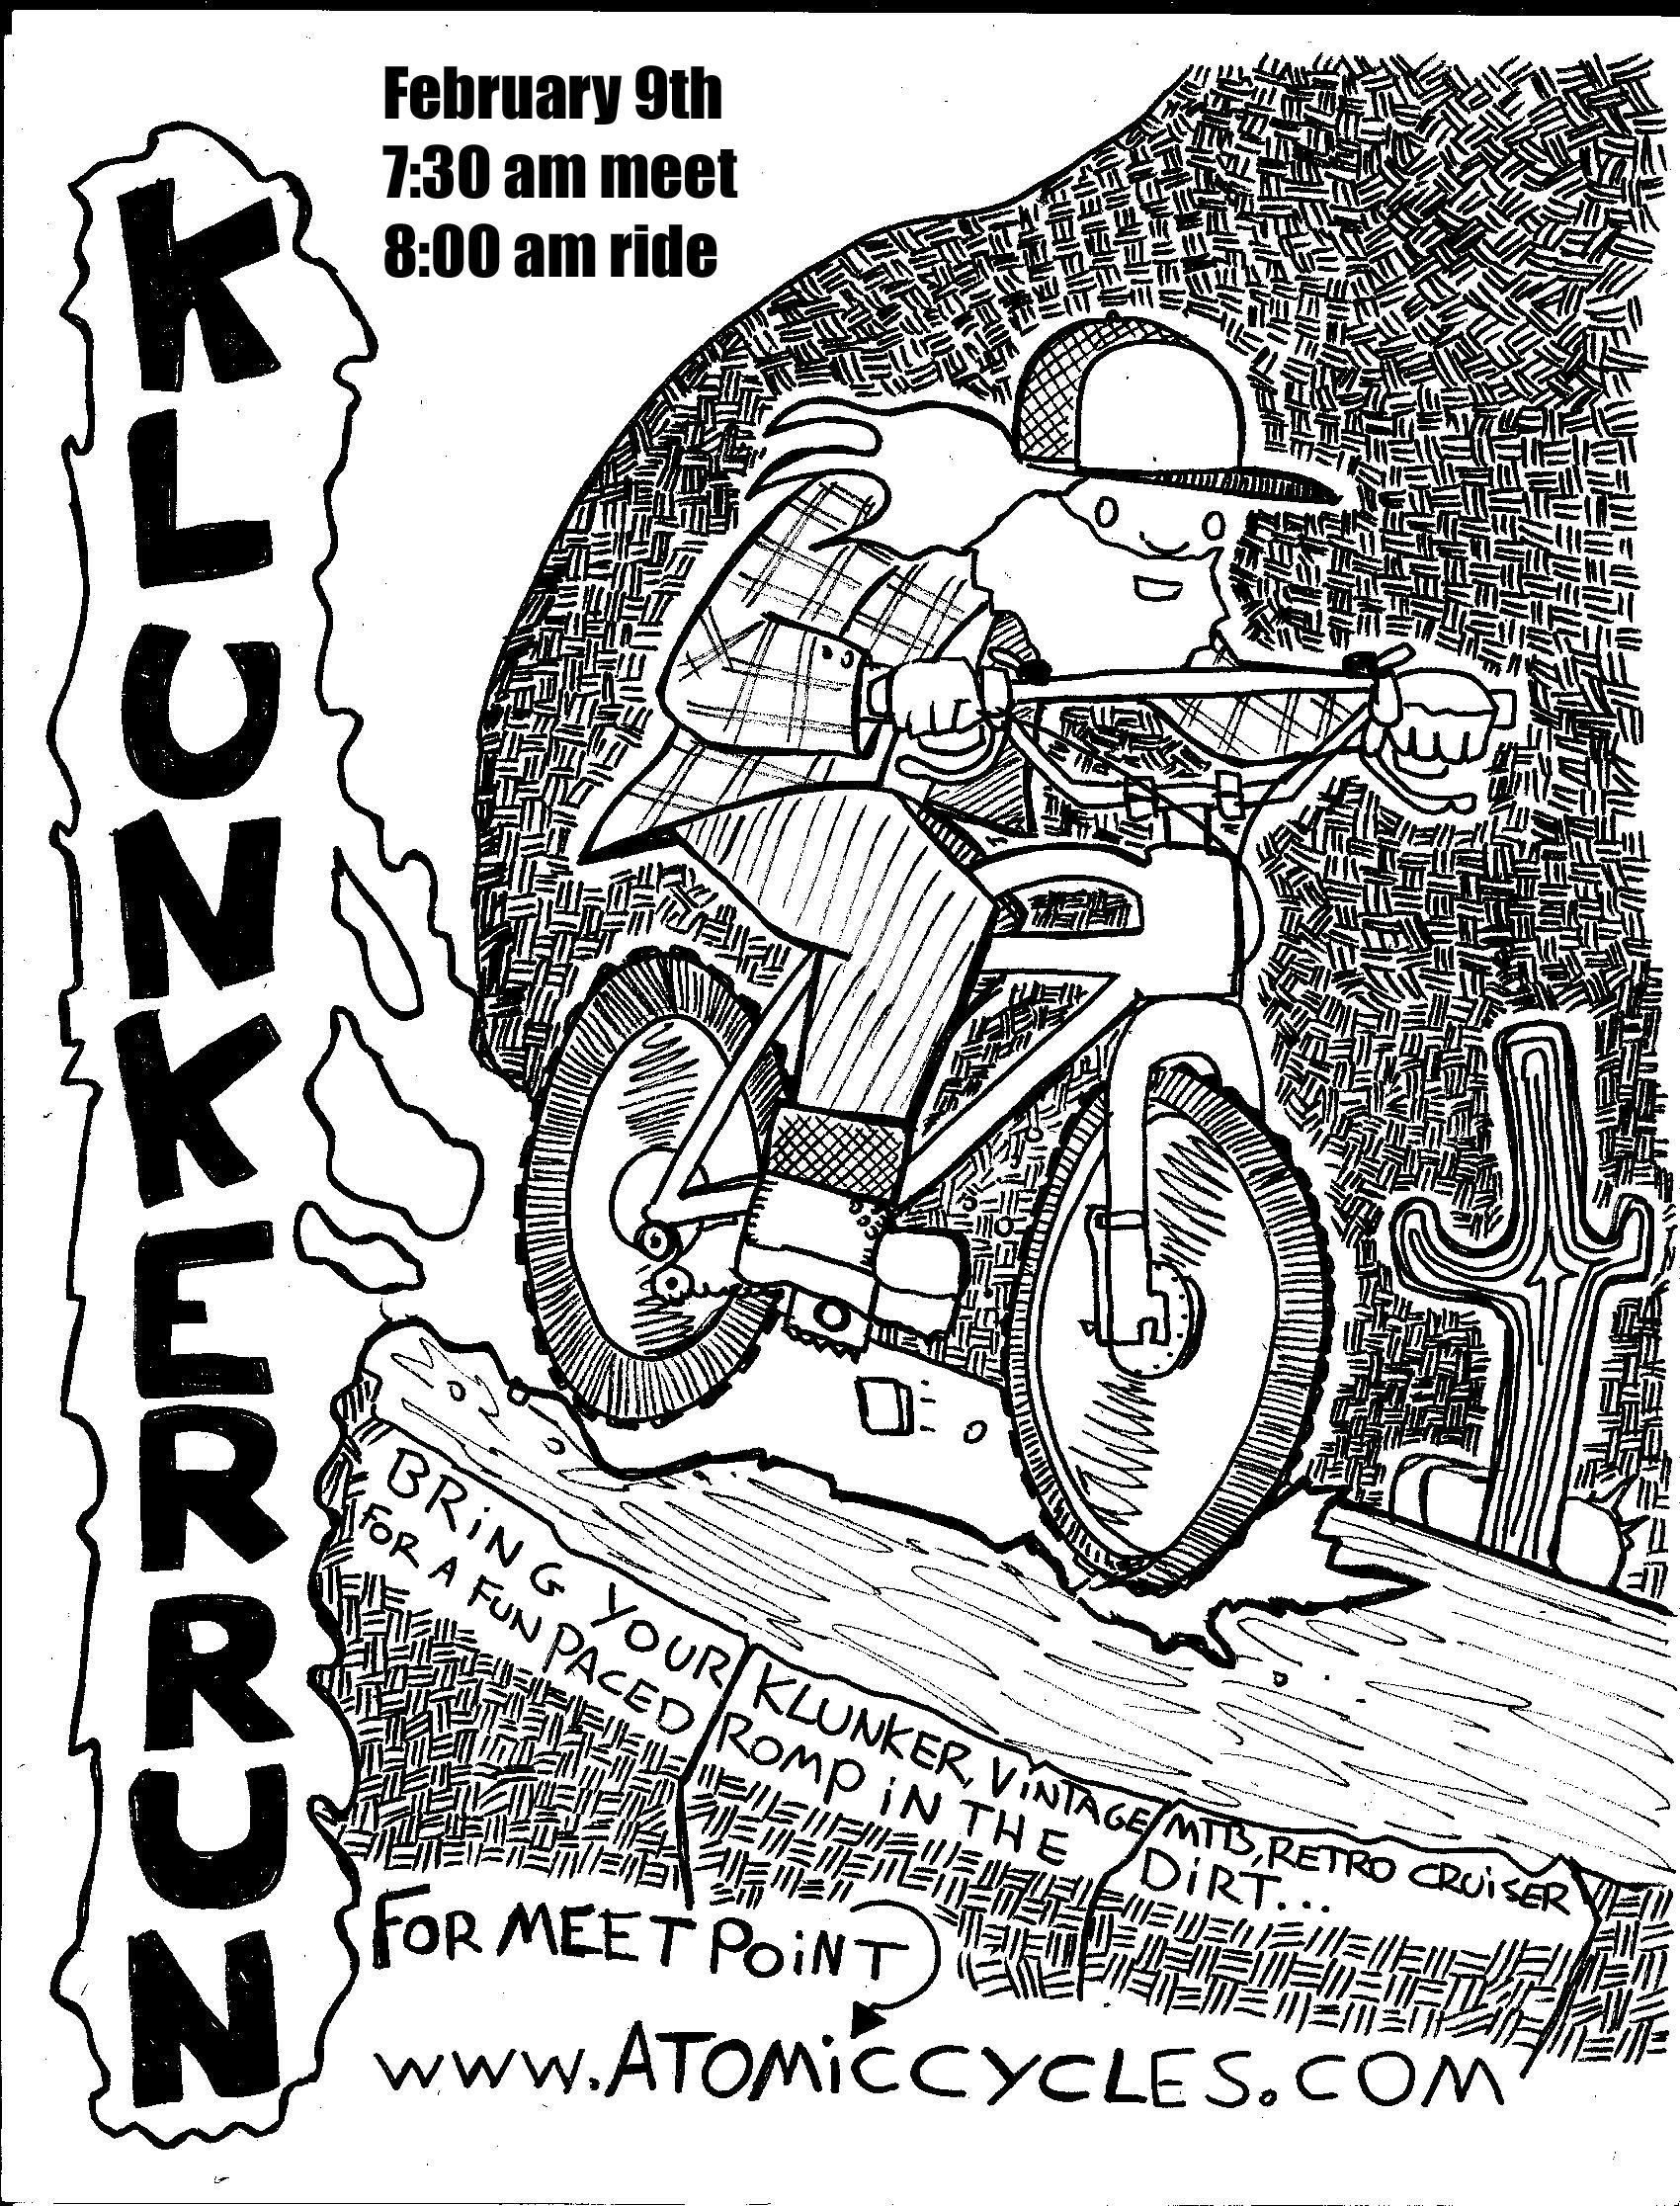 http://atomiccycles.com/klunkerrun20201.jpg